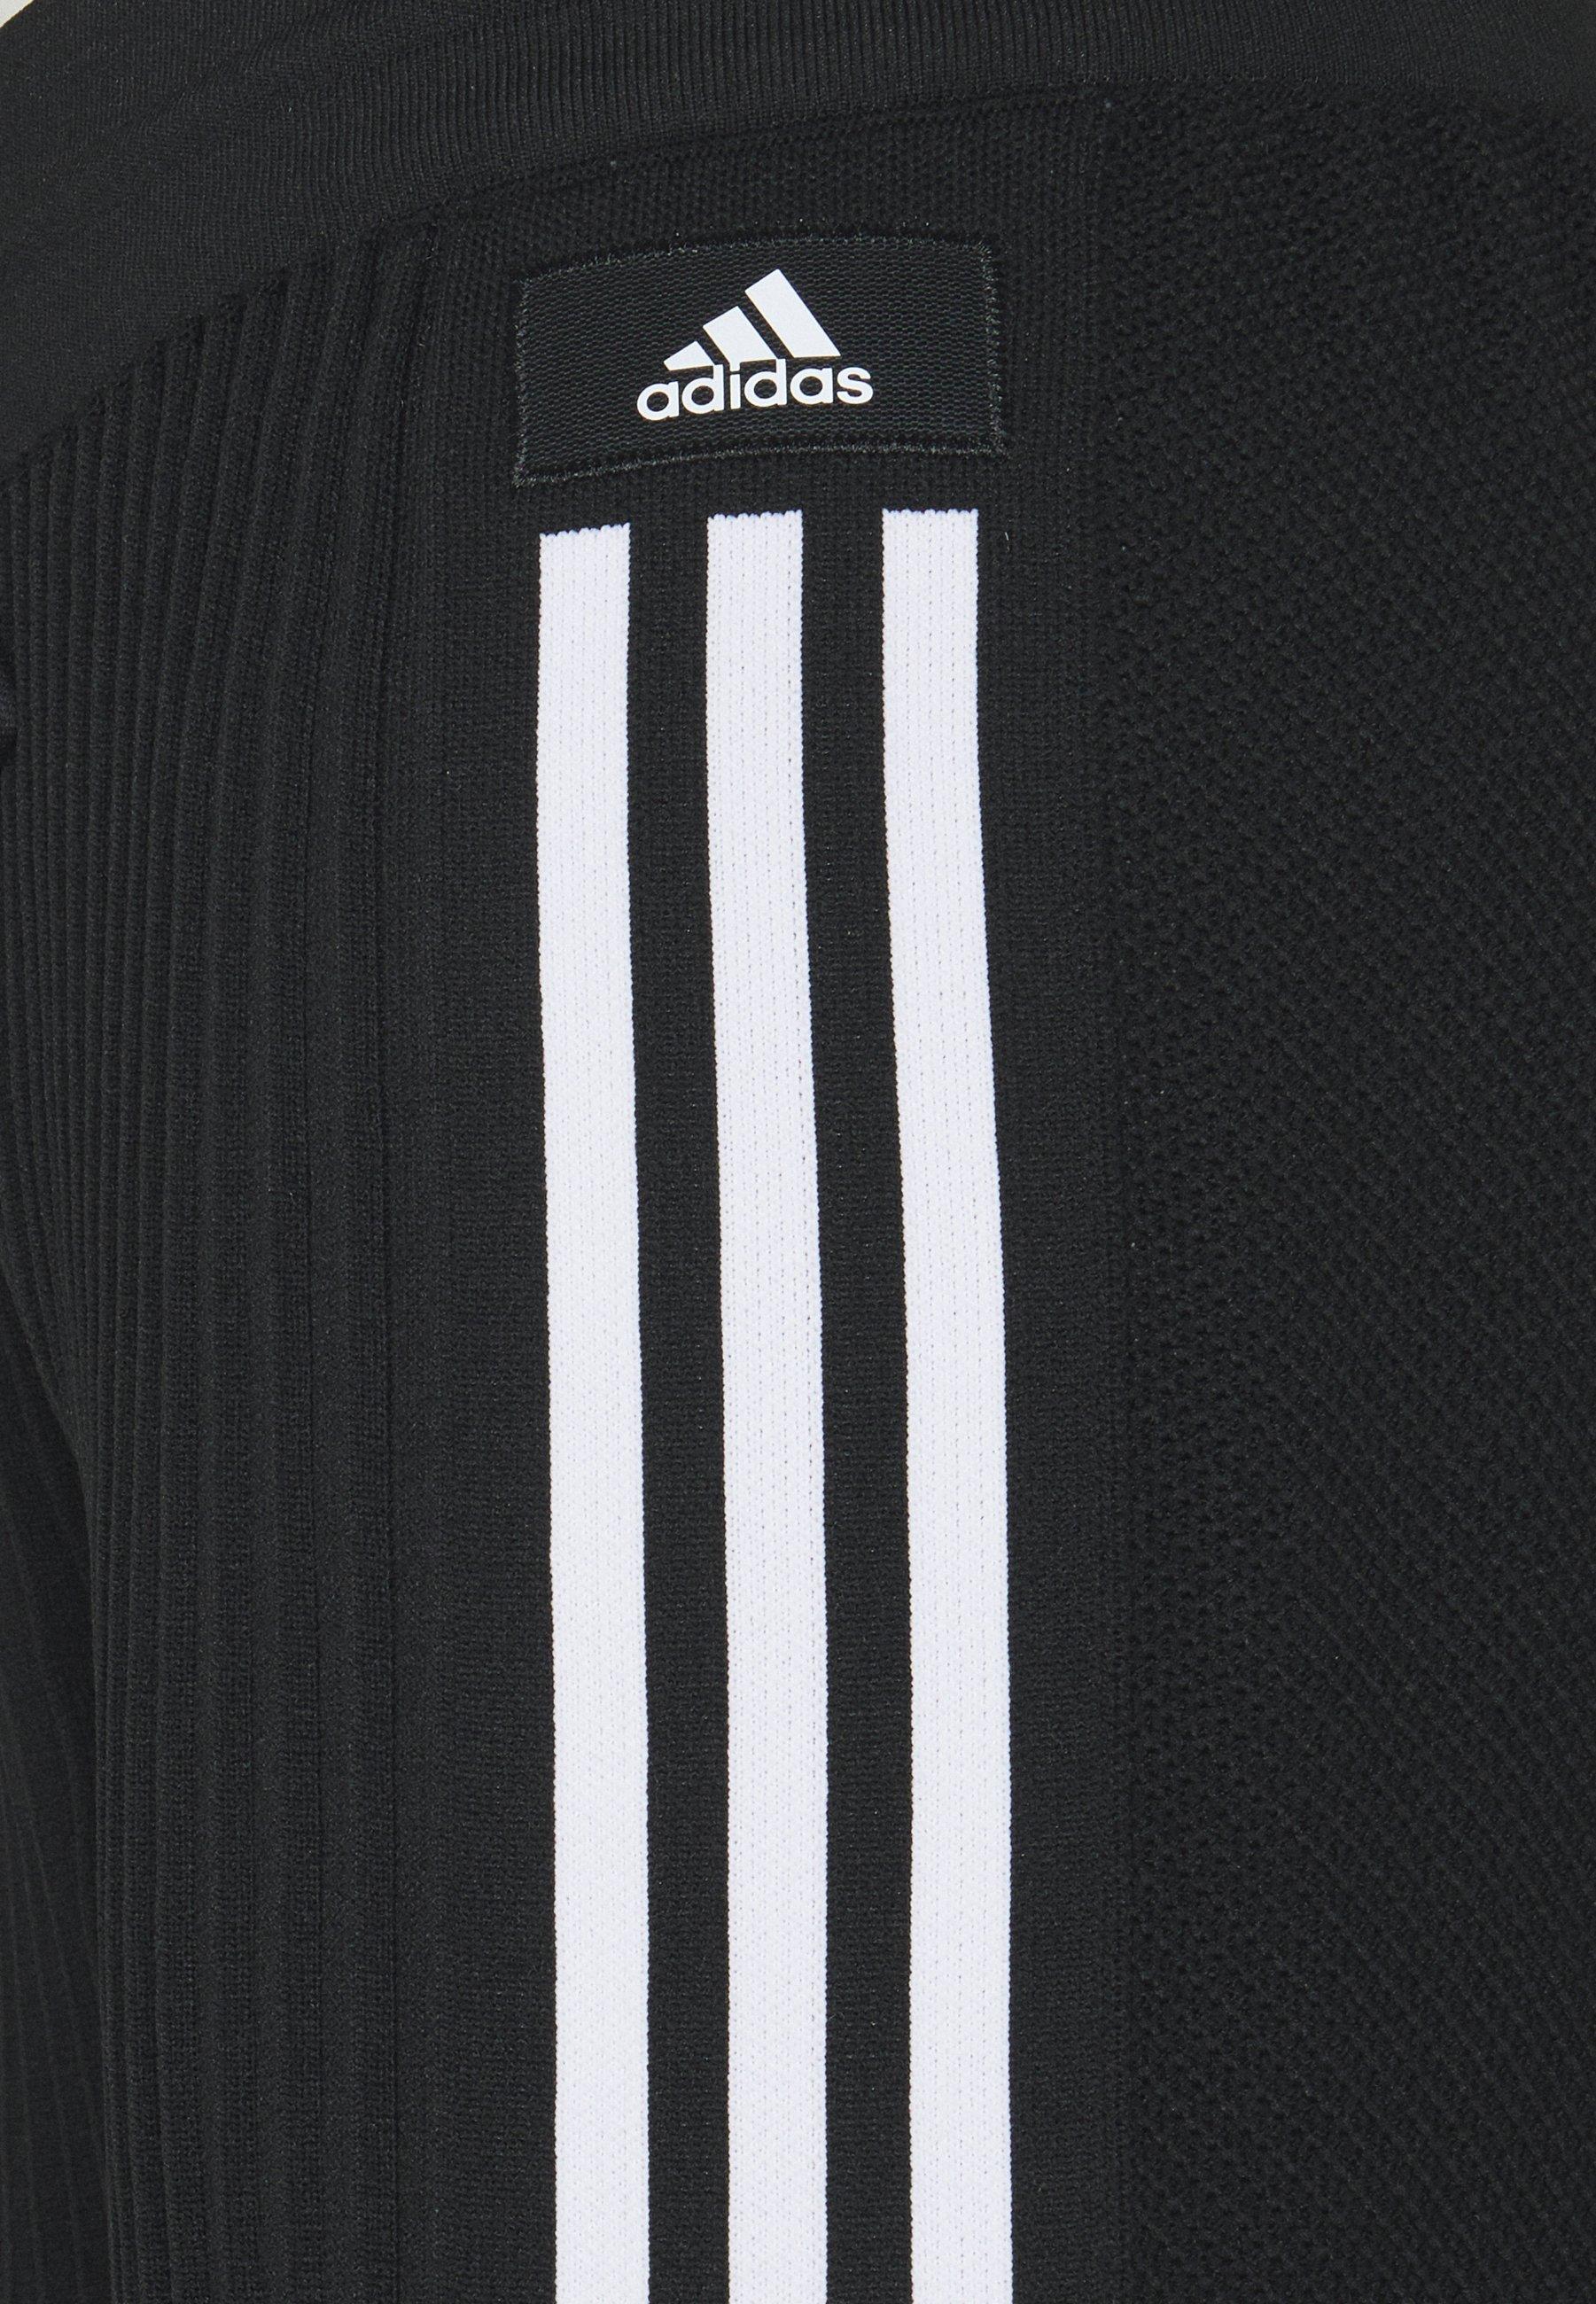 Reliable Cool Shopping Women's Clothing adidas Performance Tracksuit bottoms black HnFldafiP EzhJgZZyL